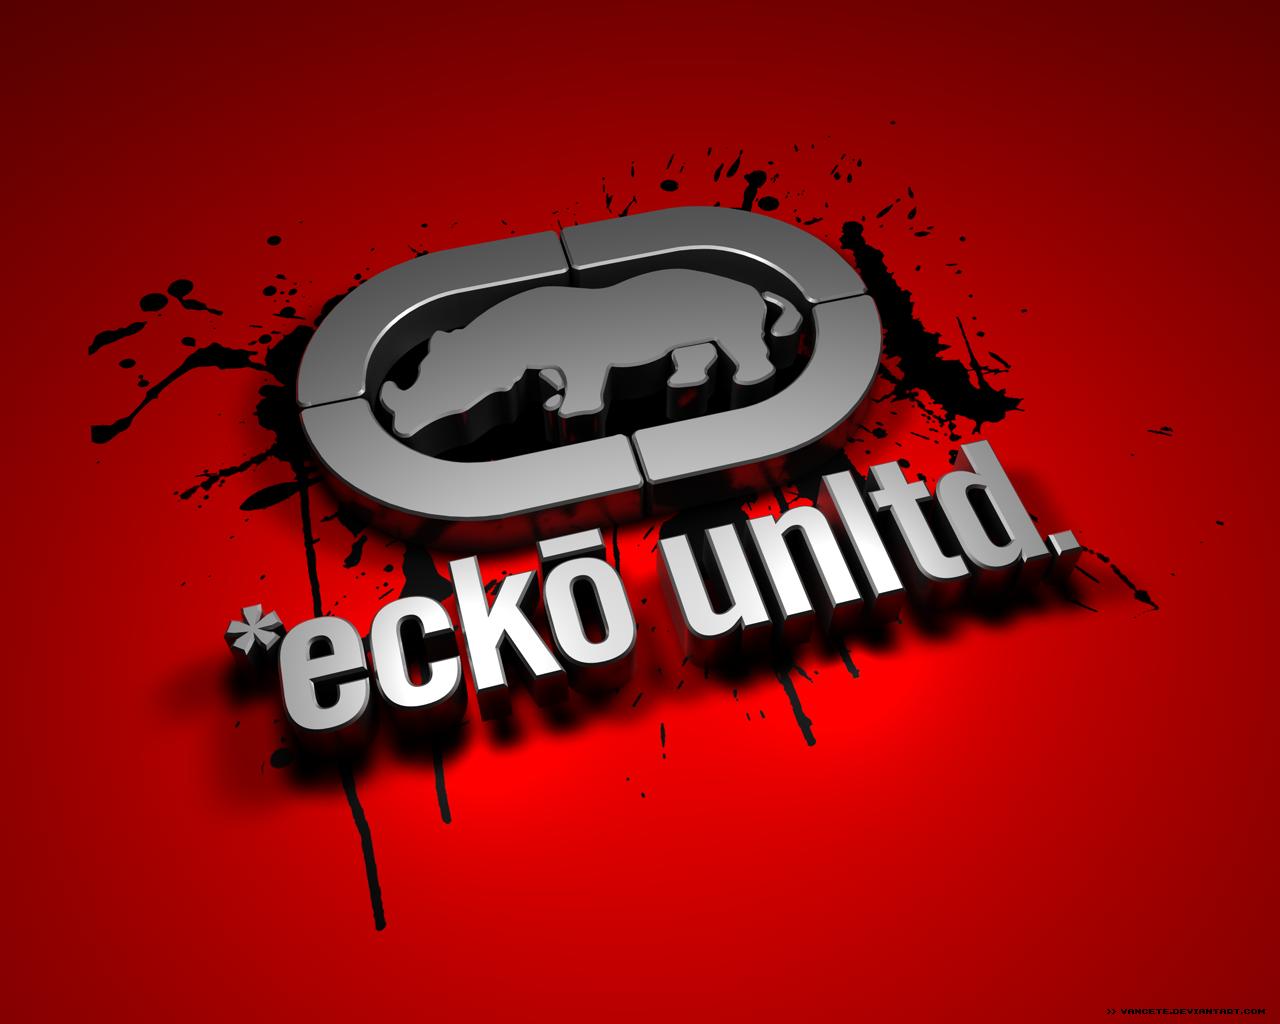 http://1.bp.blogspot.com/_IPOuuwVTCLg/TFwCM-nrNFI/AAAAAAAAAAY/kSzwOiJ_KKw/s1600/Red_Ecko_Unltd_.png